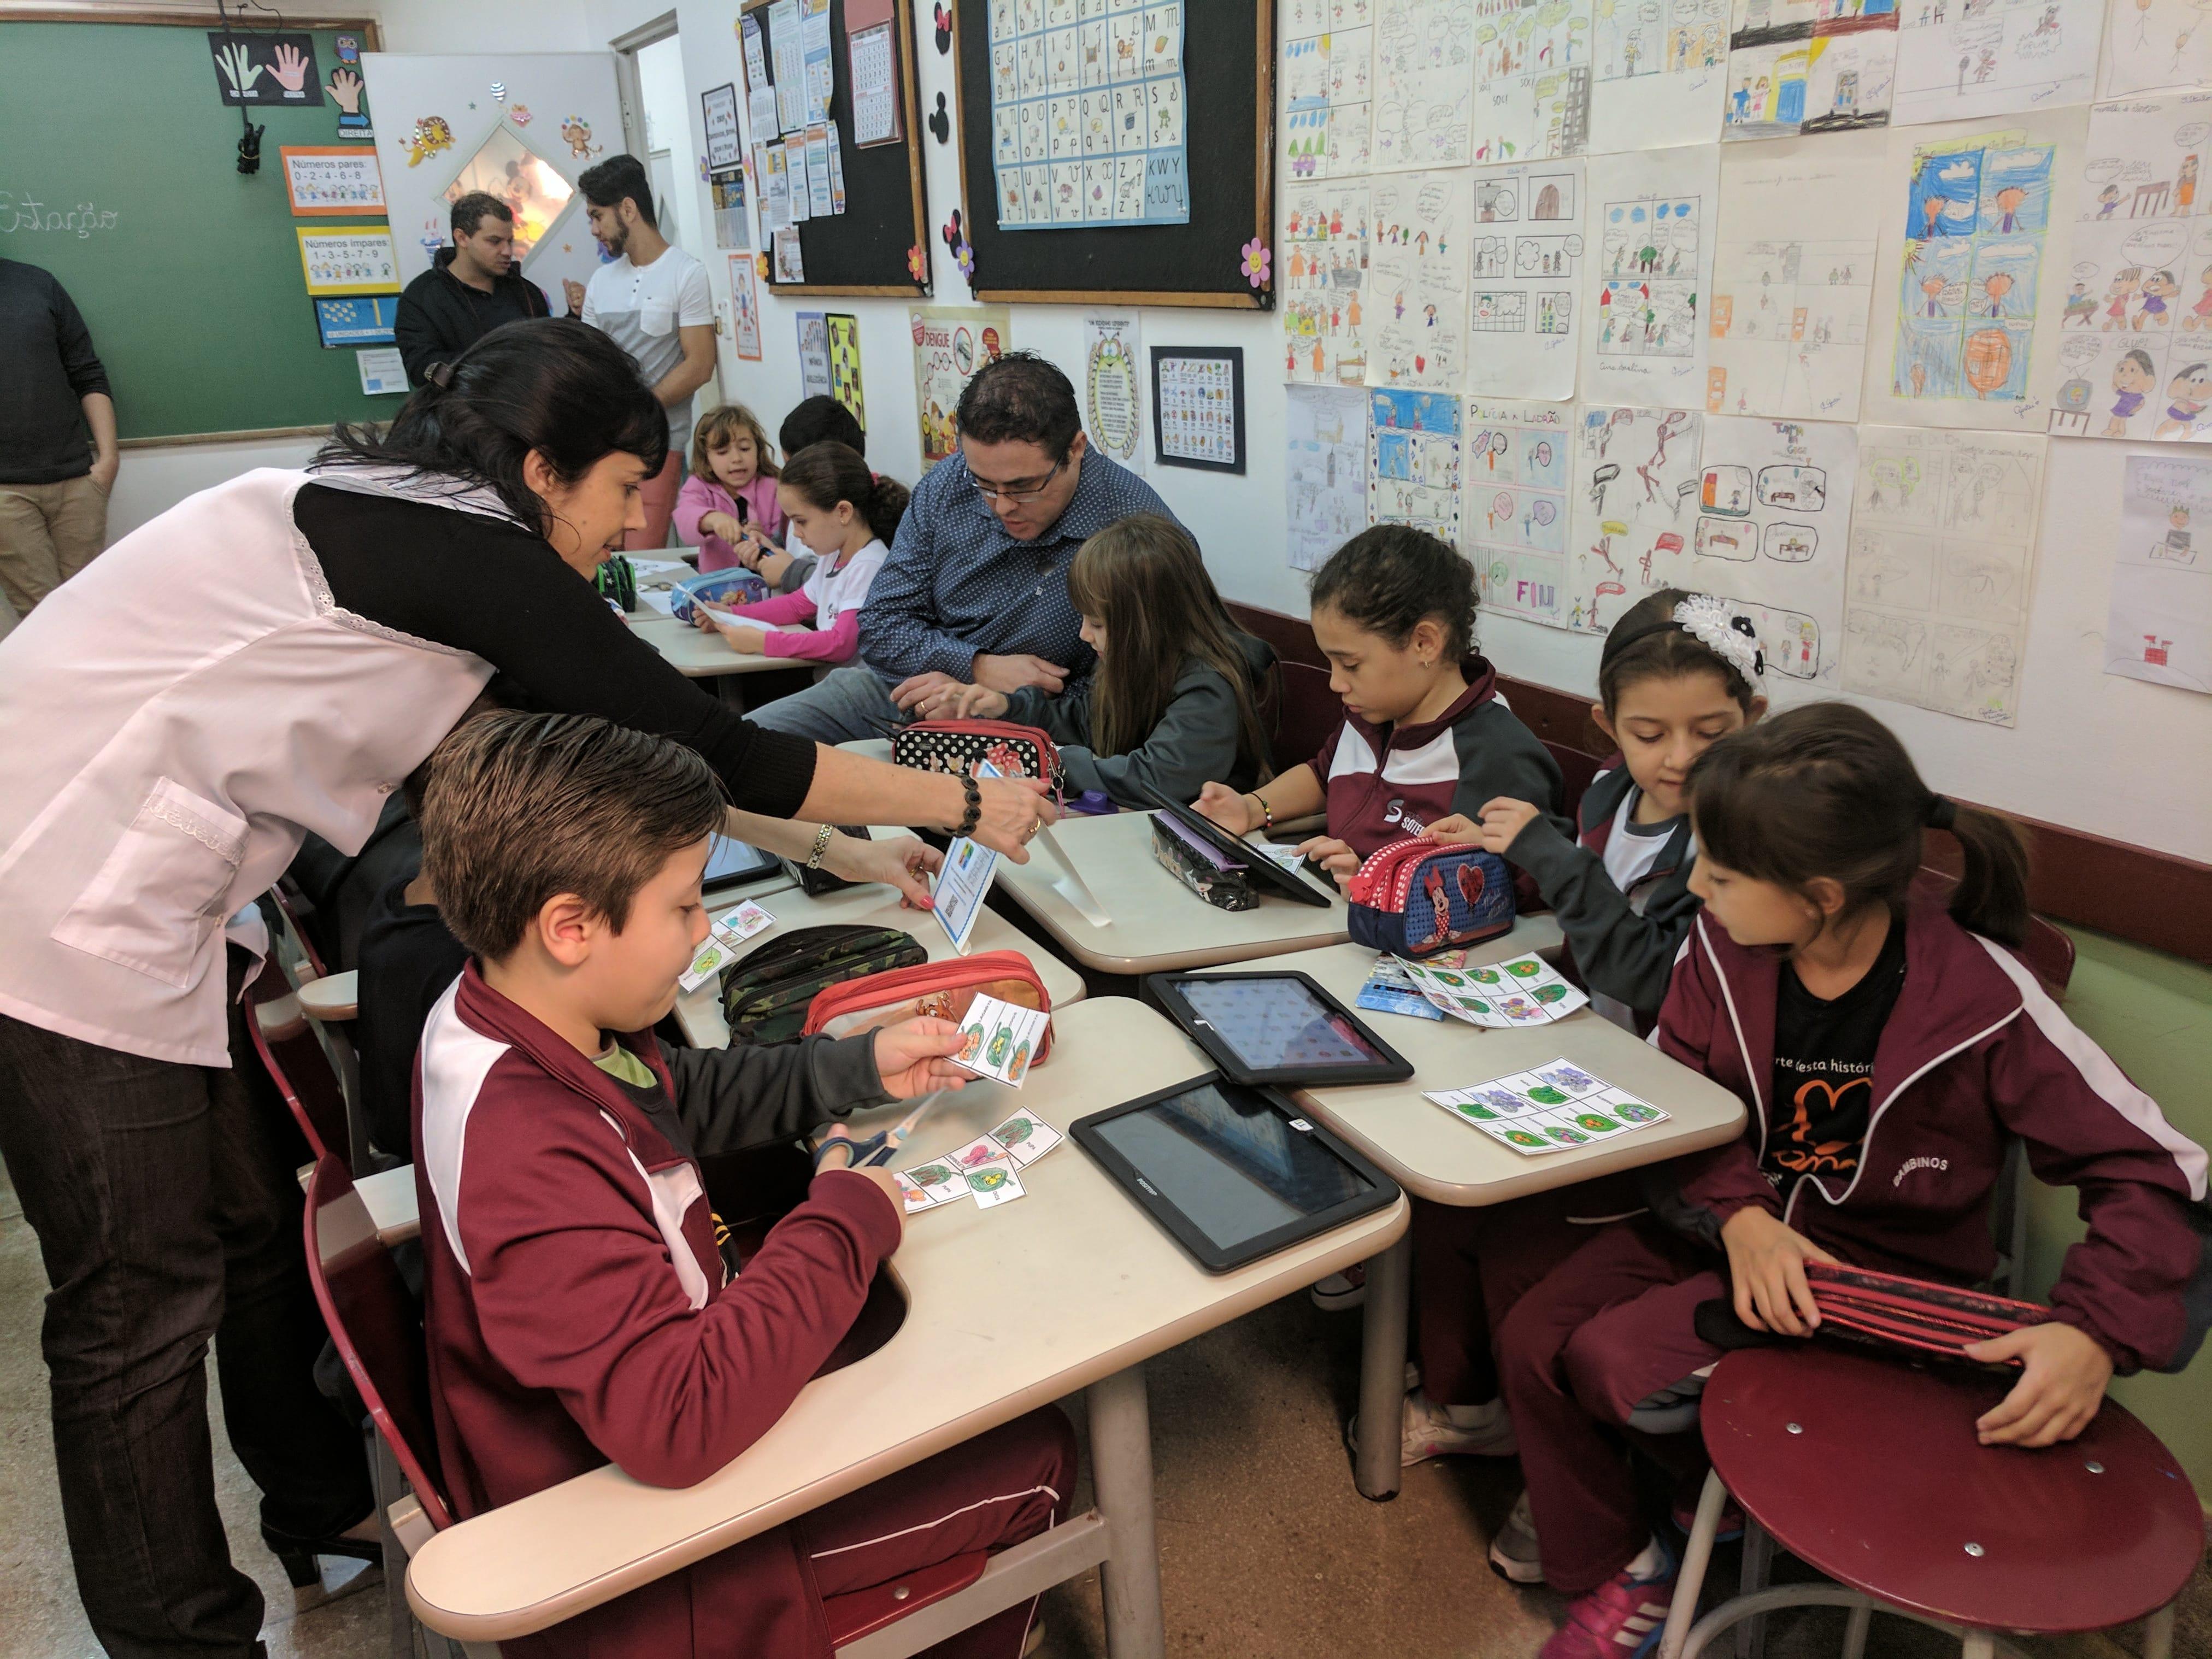 colegio_soter_blended_learning1